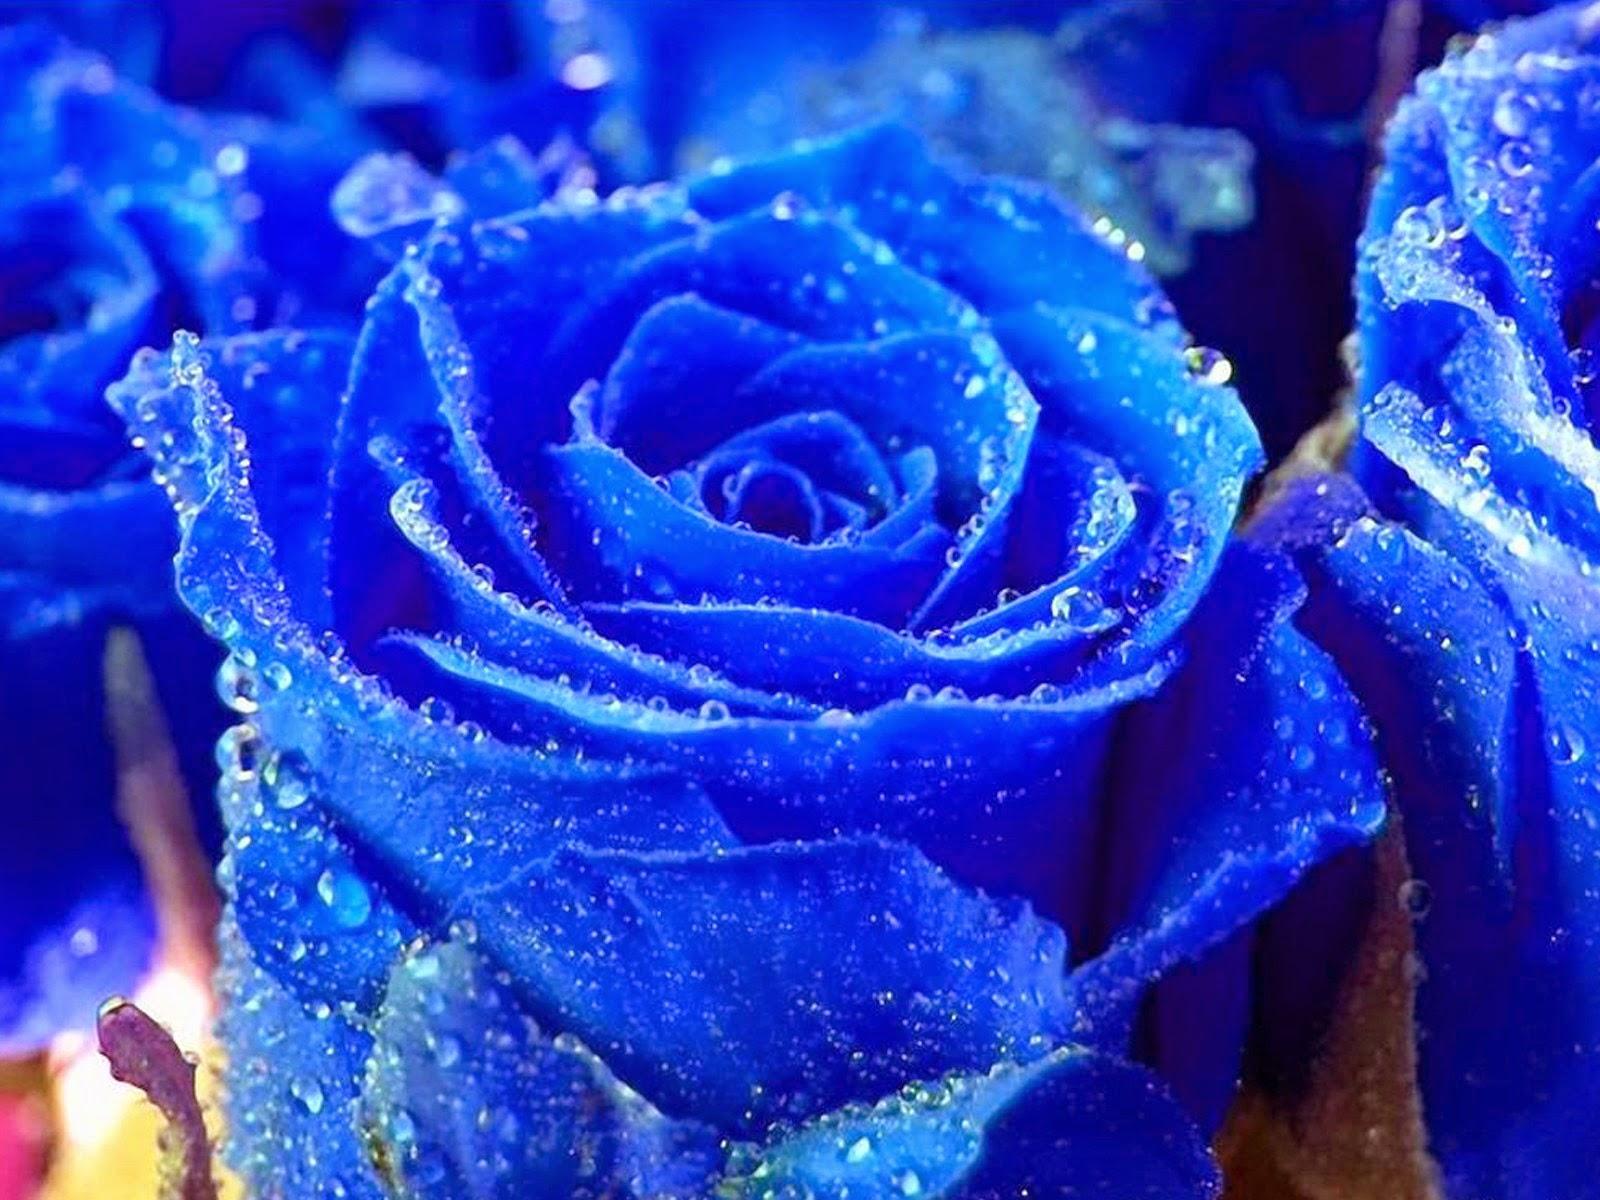 free hit 4u wallpapers: osam blue rose hd wallpaper